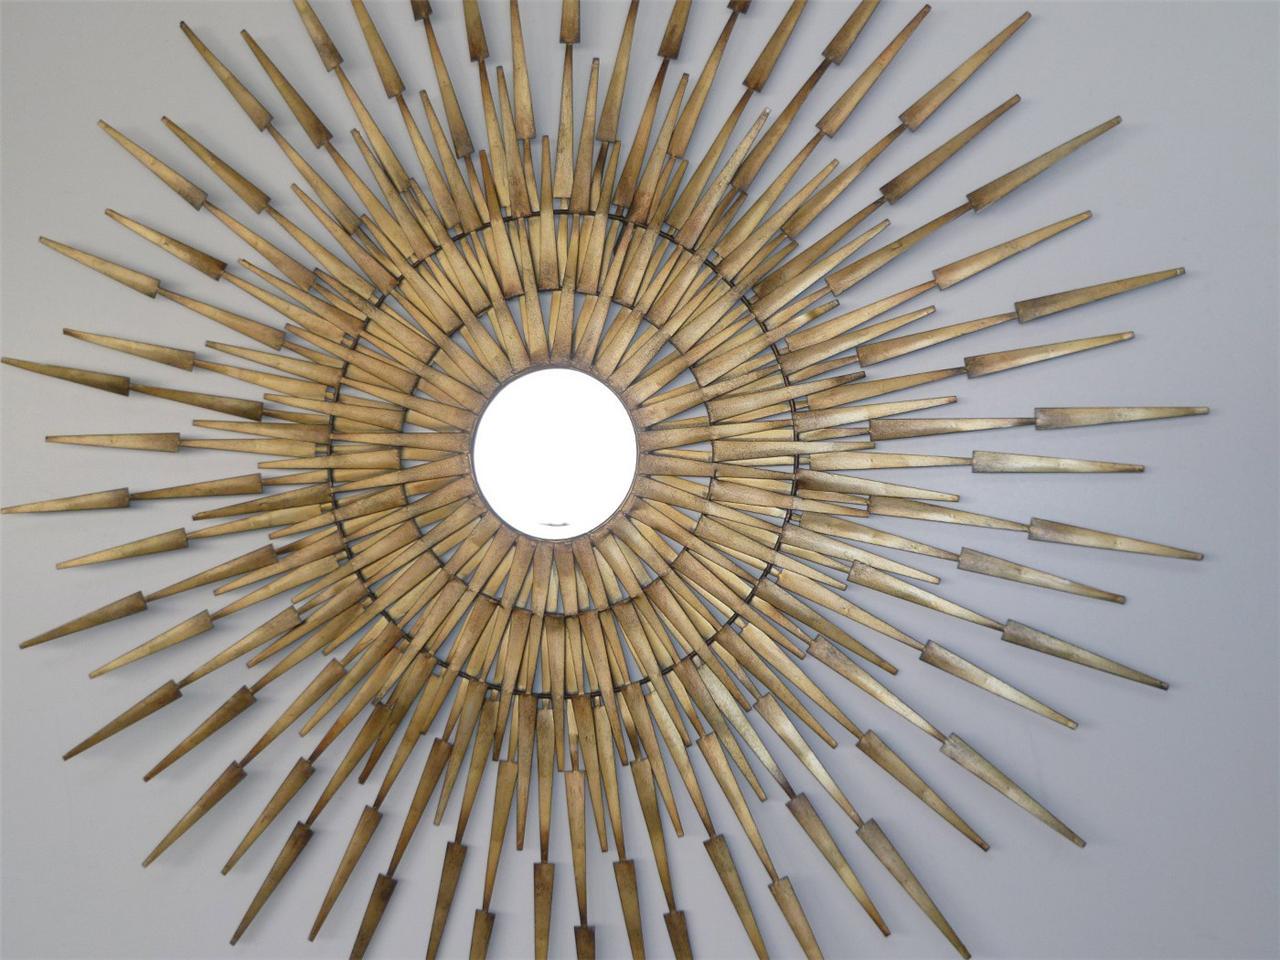 Metal wall art stunning gold sunburst mirrored wall decor for Sunburst wall art